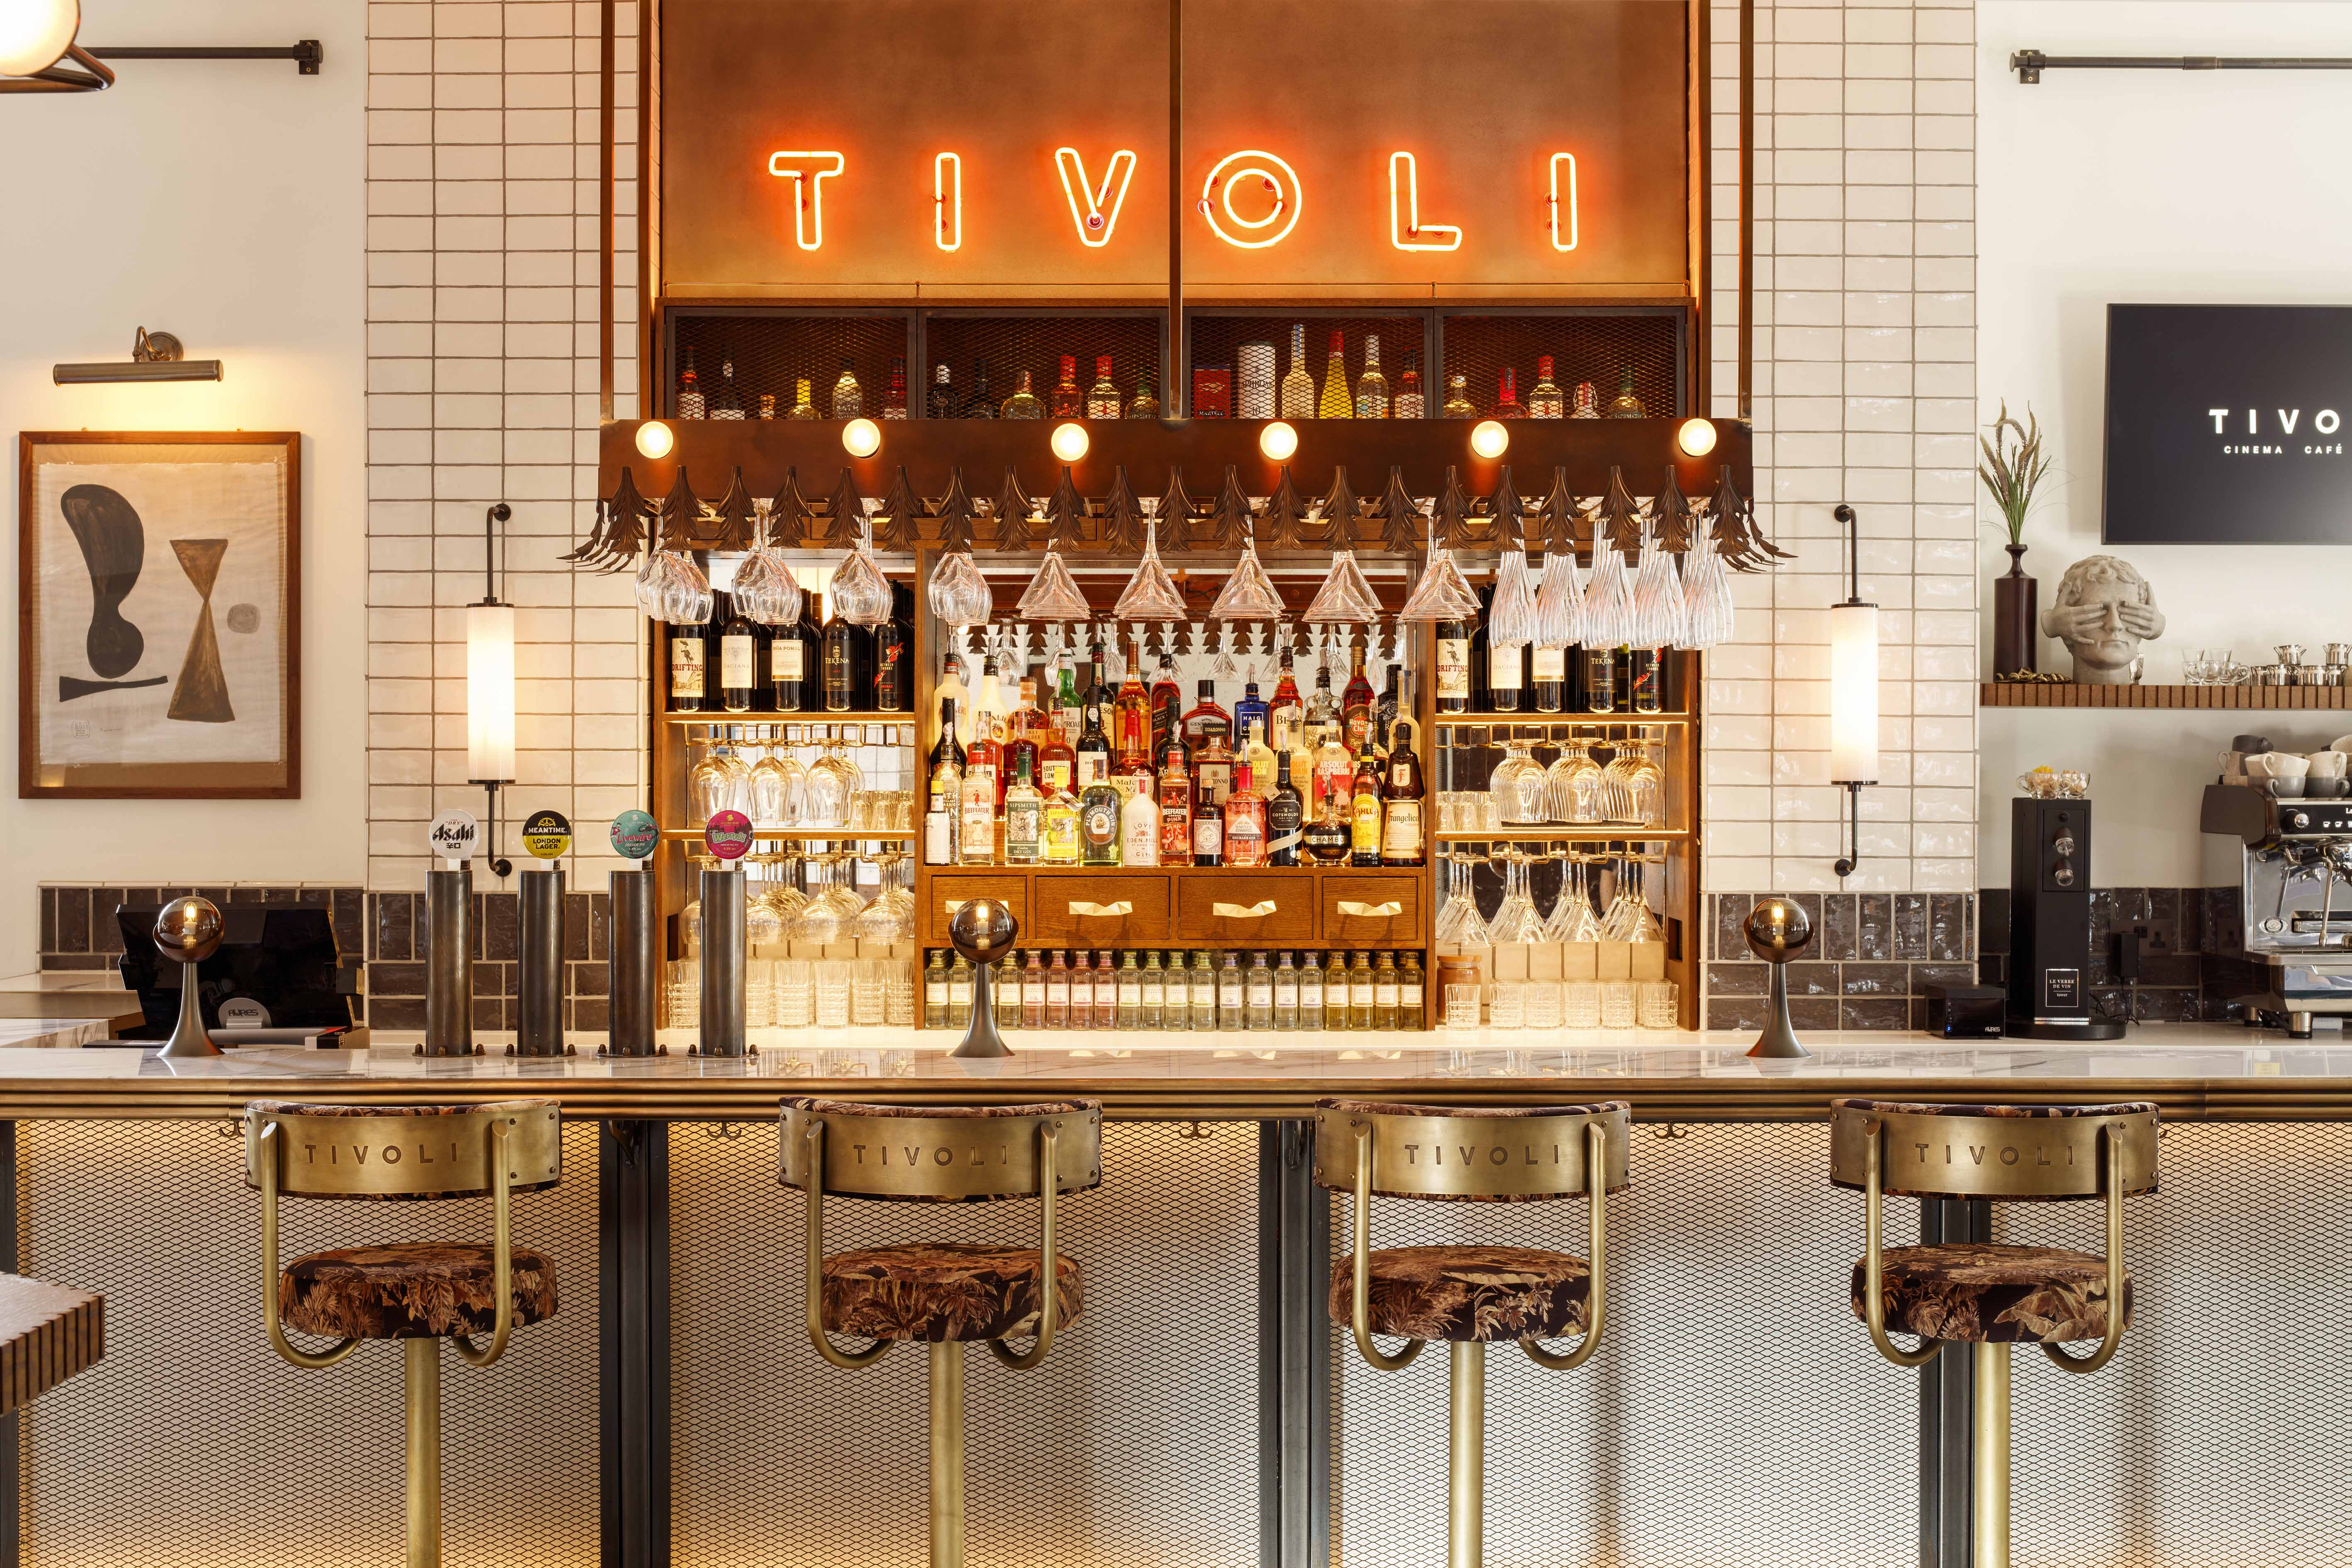 Tivoli Cinema bar